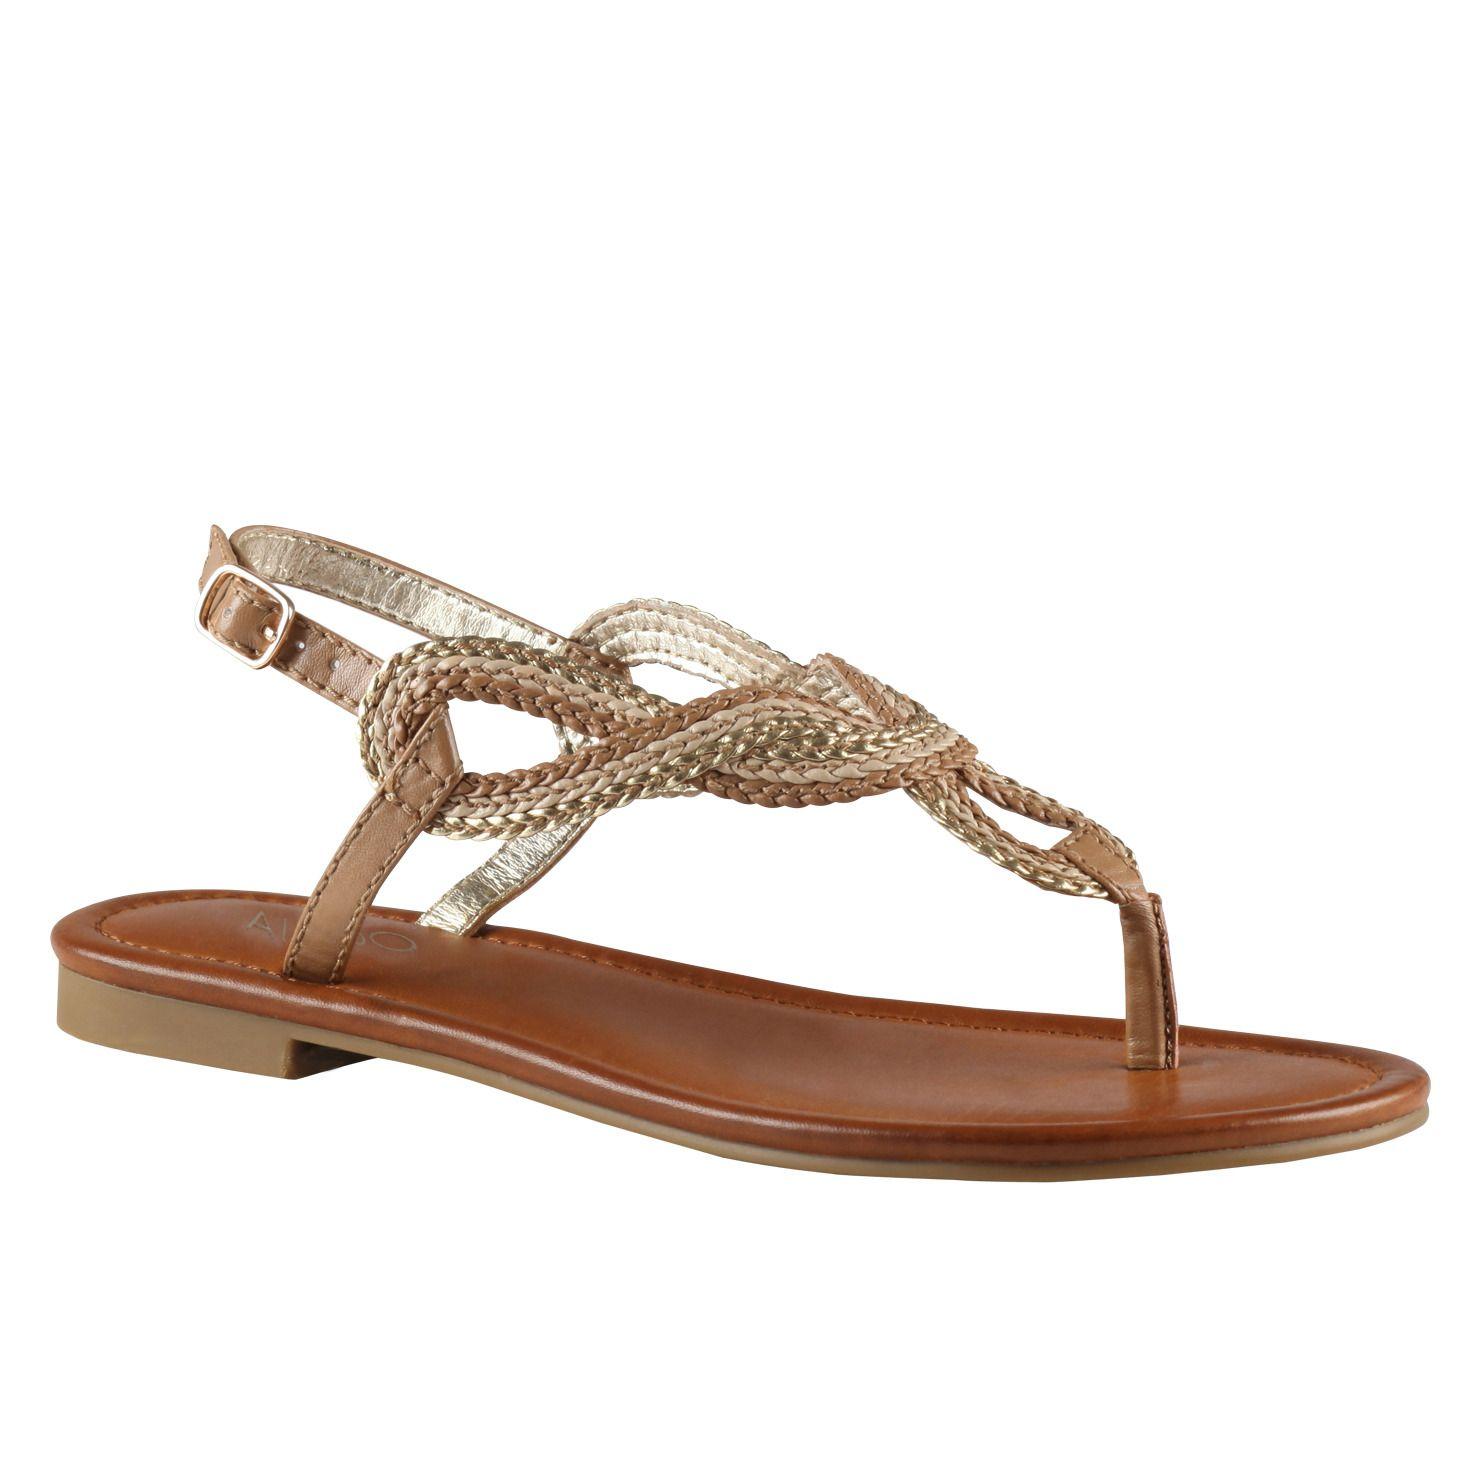 MOCHUDI womens flats sandals for sale at ALDO Shoes